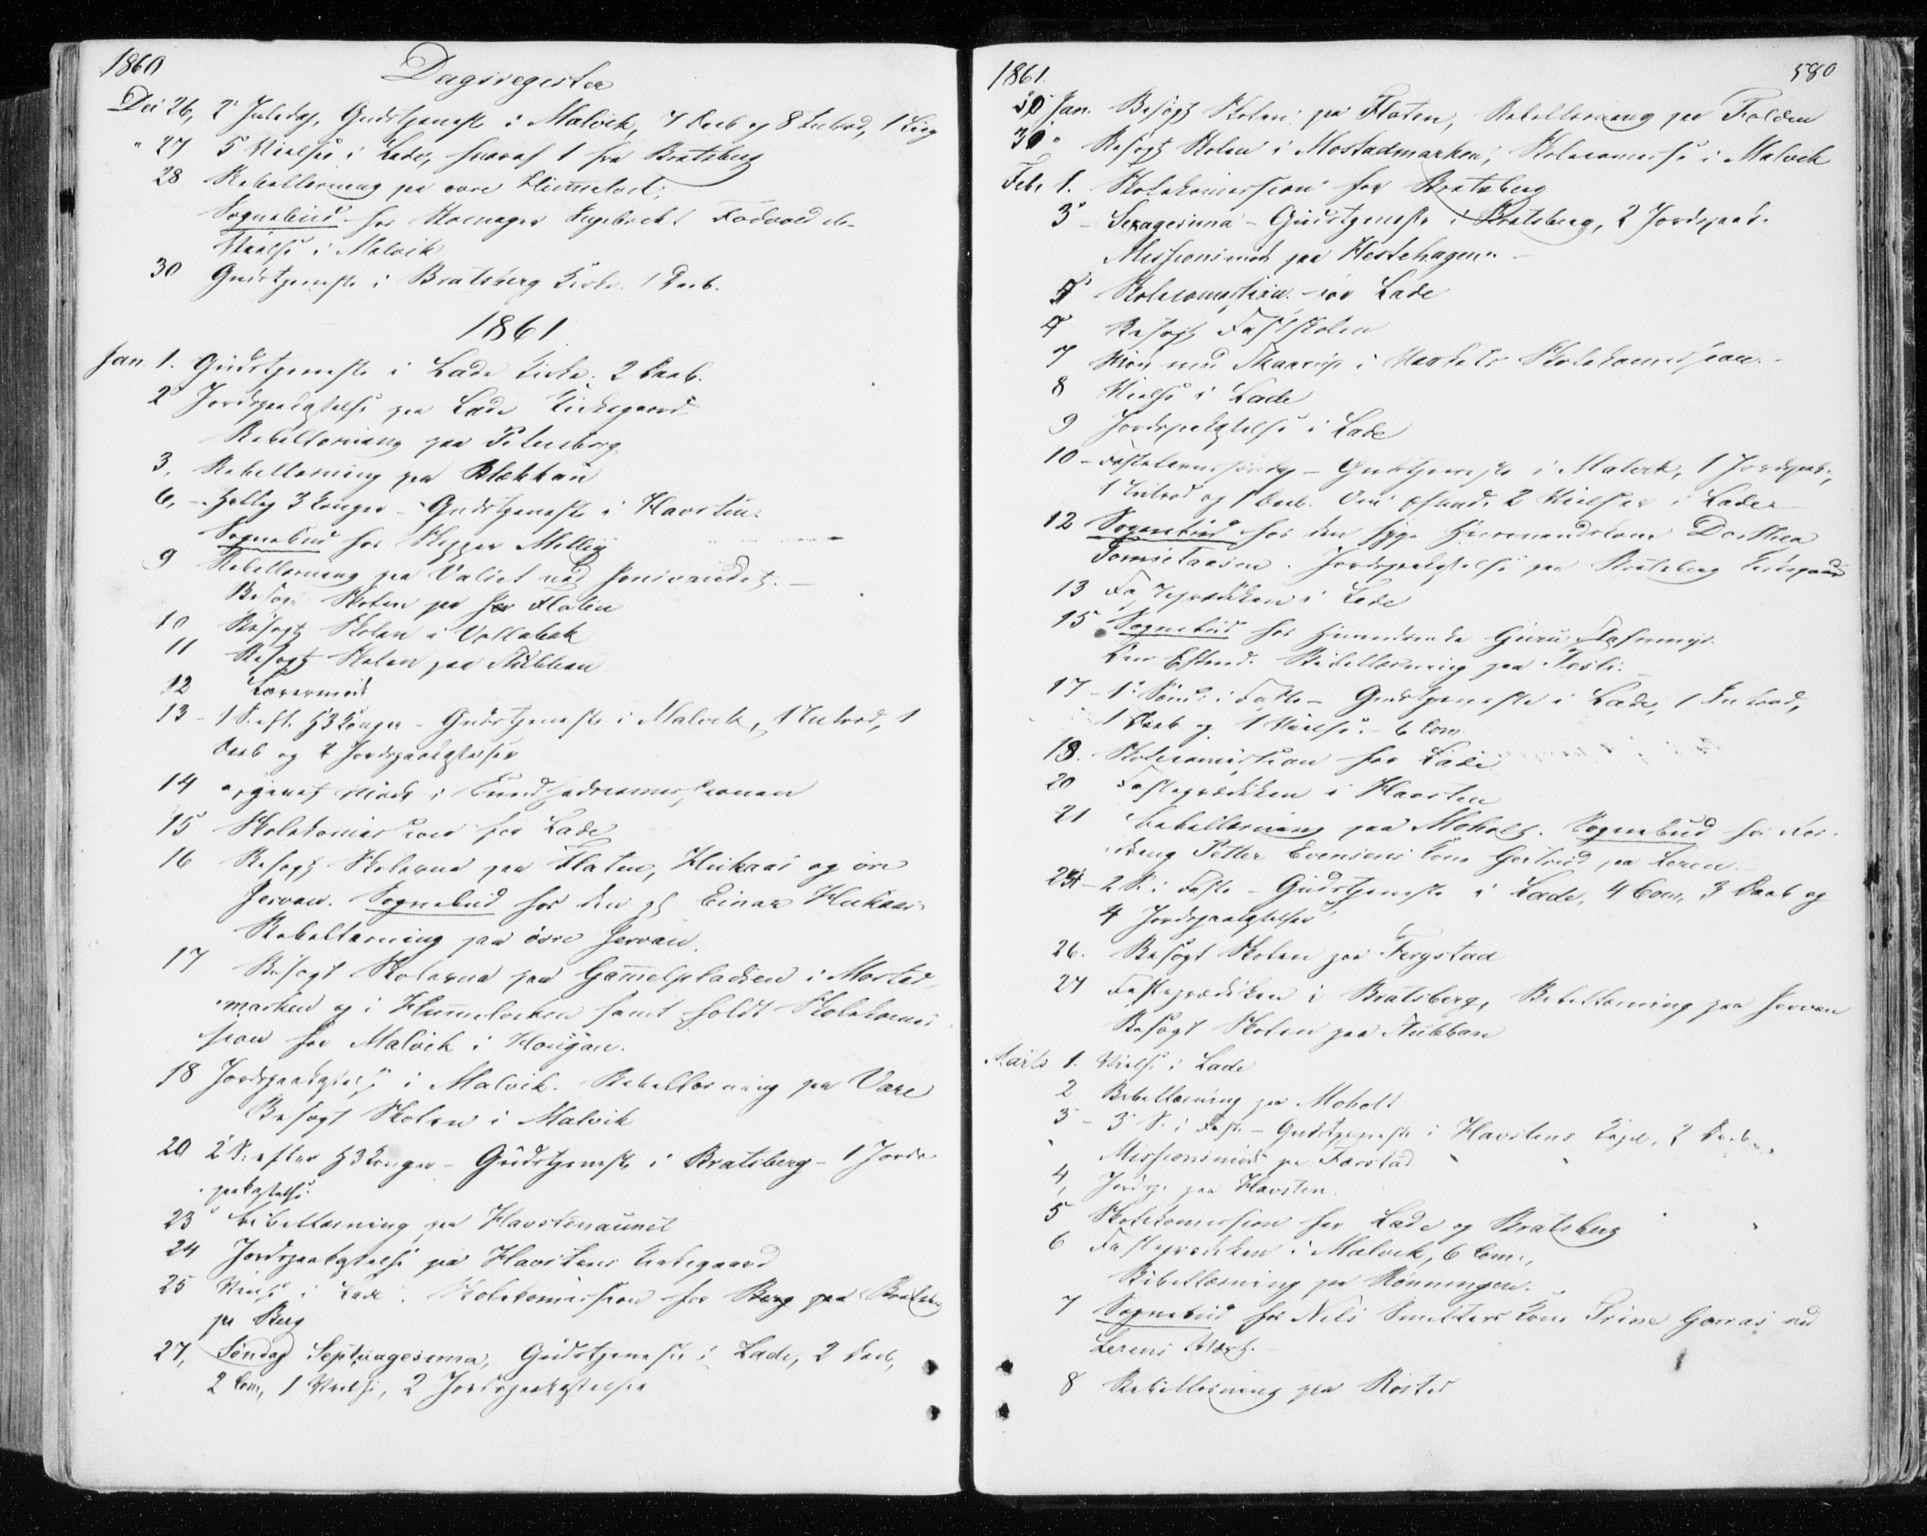 SAT, Ministerialprotokoller, klokkerbøker og fødselsregistre - Sør-Trøndelag, 606/L0292: Parish register (official) no. 606A07, 1856-1865, p. 580